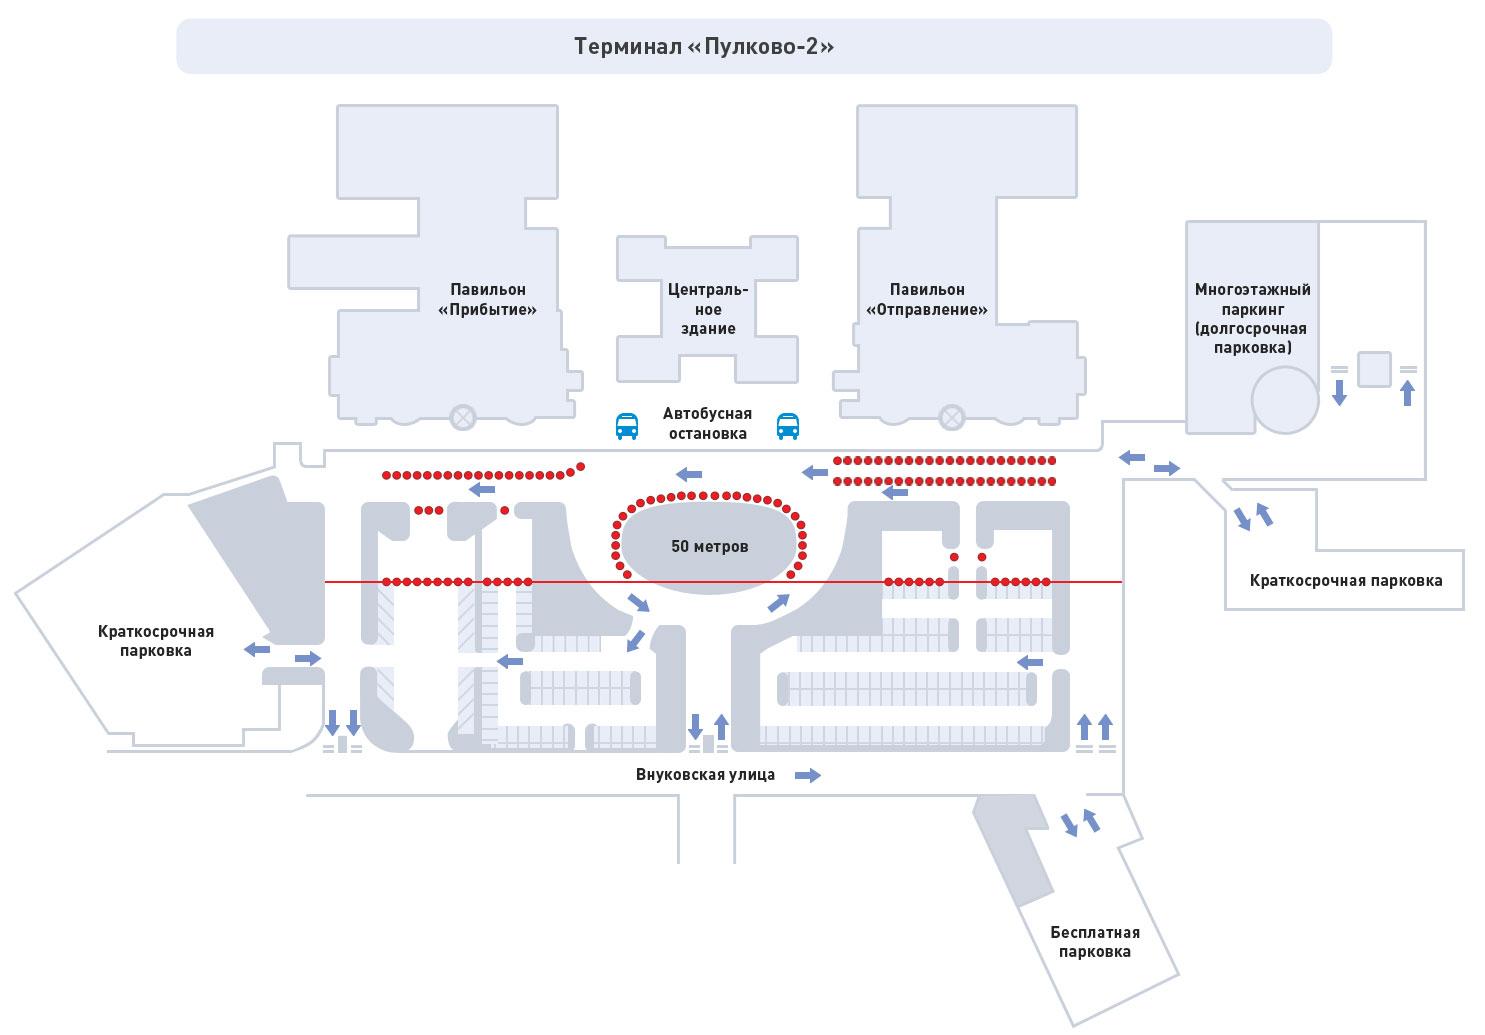 Аэропорт Пулково-2, международный | Вокзалы | Единая ...: http://spb.ros-spravka.ru/catalog/intercity_transport/aeroport_pulkovo_2_mezhdunarodnyy/